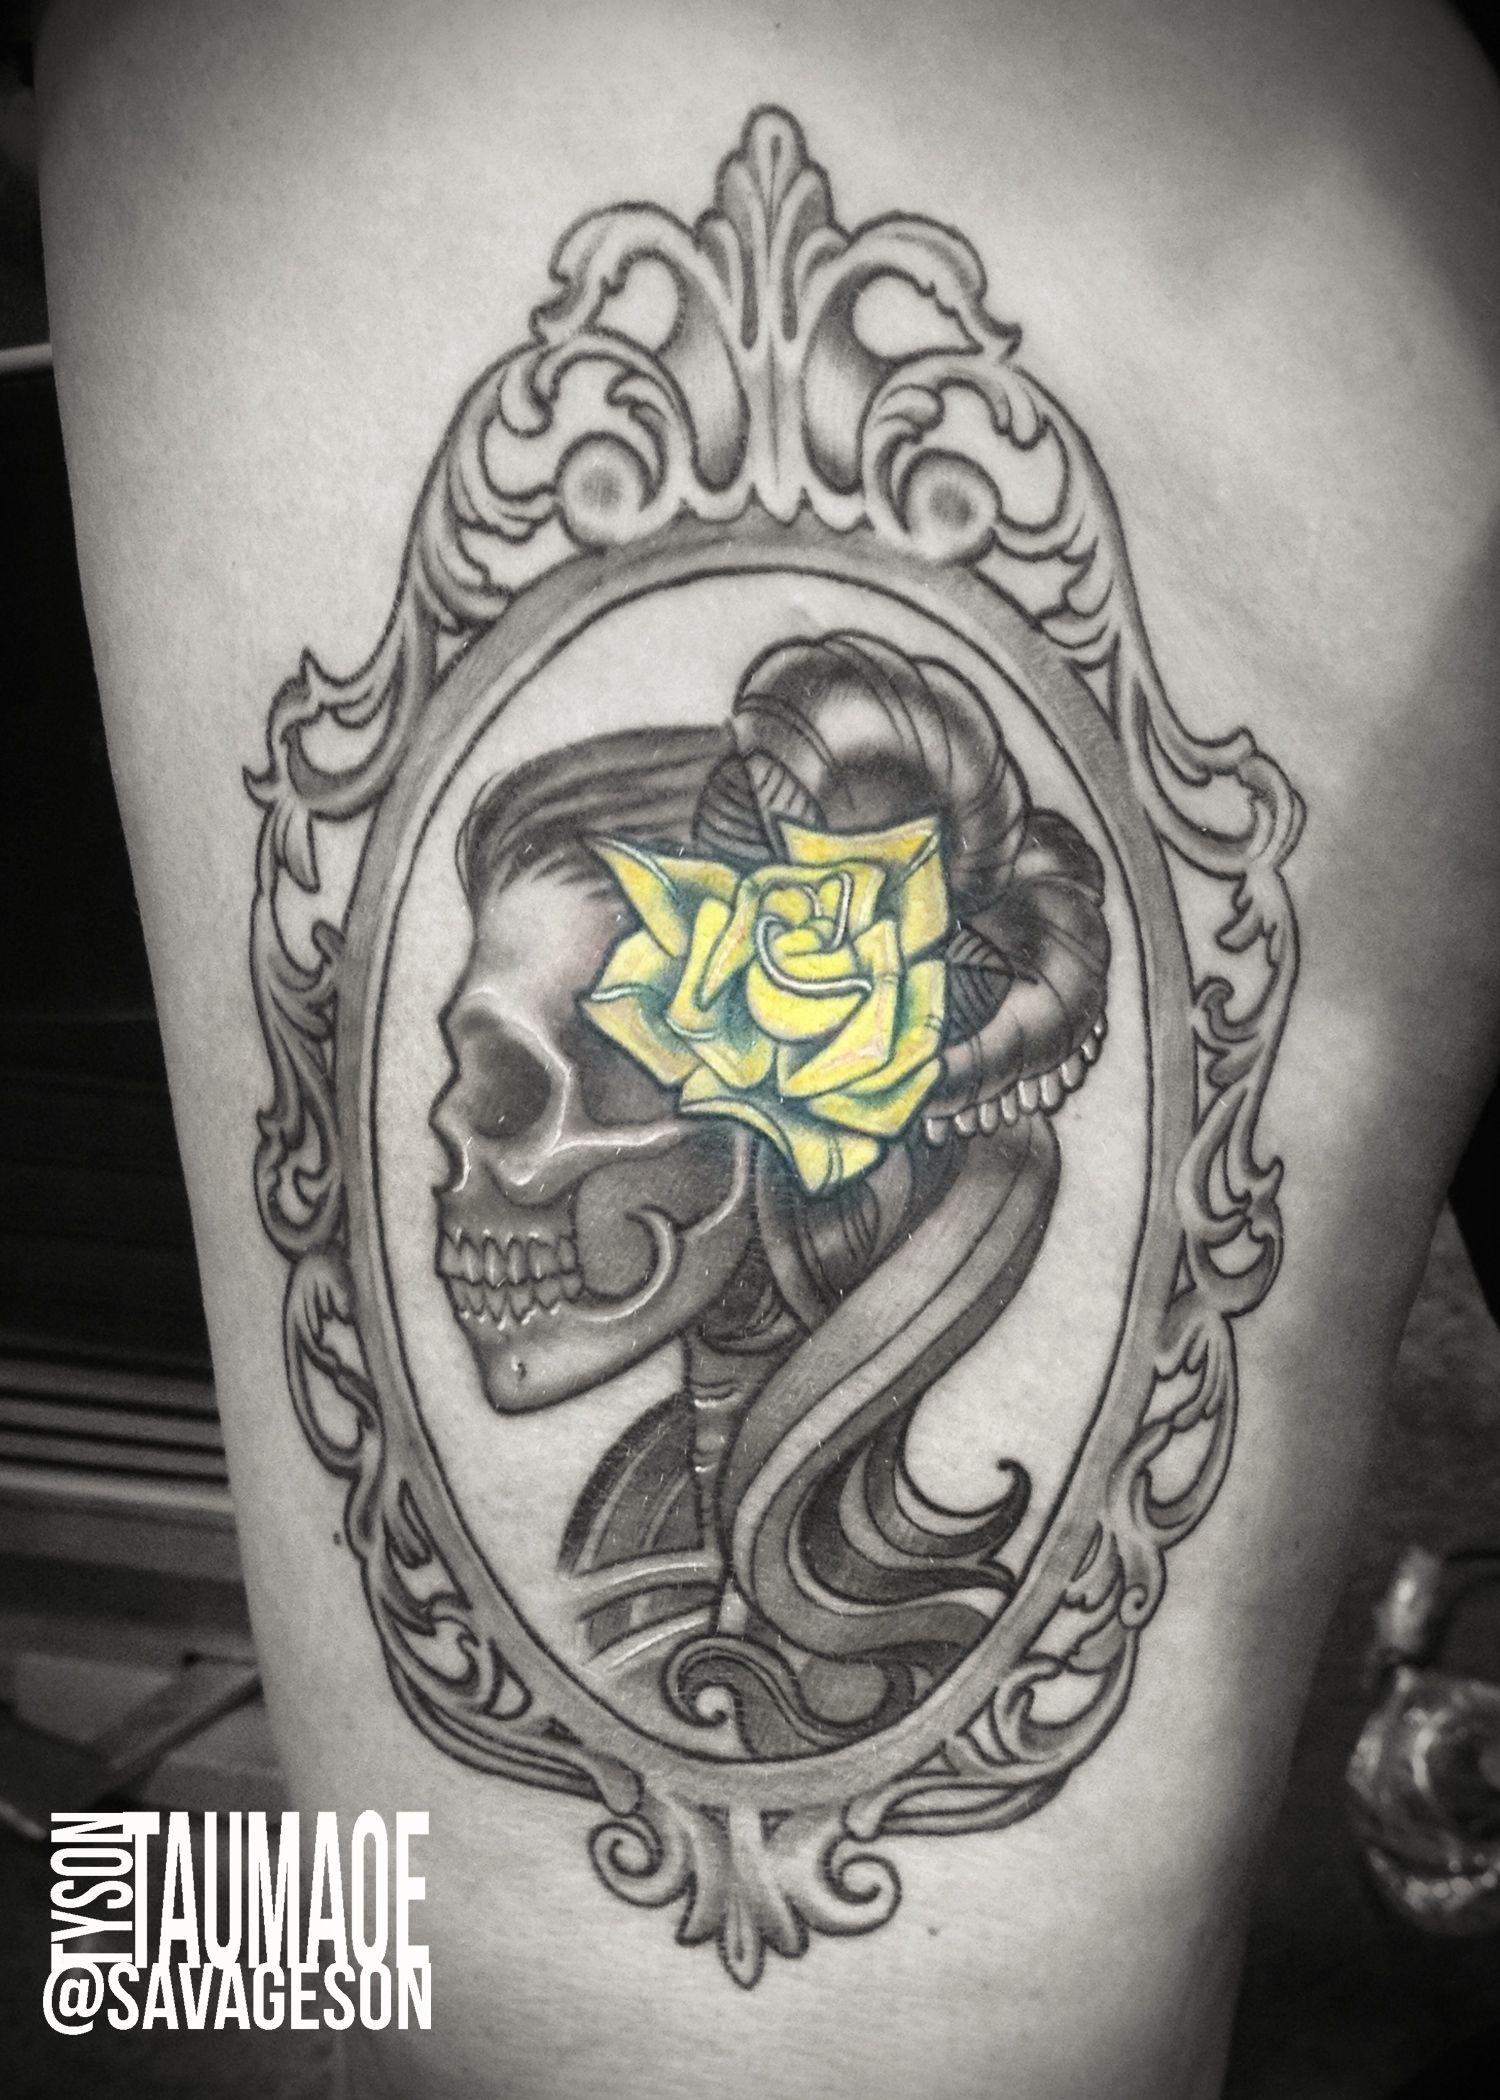 ornate frame tattoo black lady skull with ornate frame yellow rose studio21tattoo tattoos